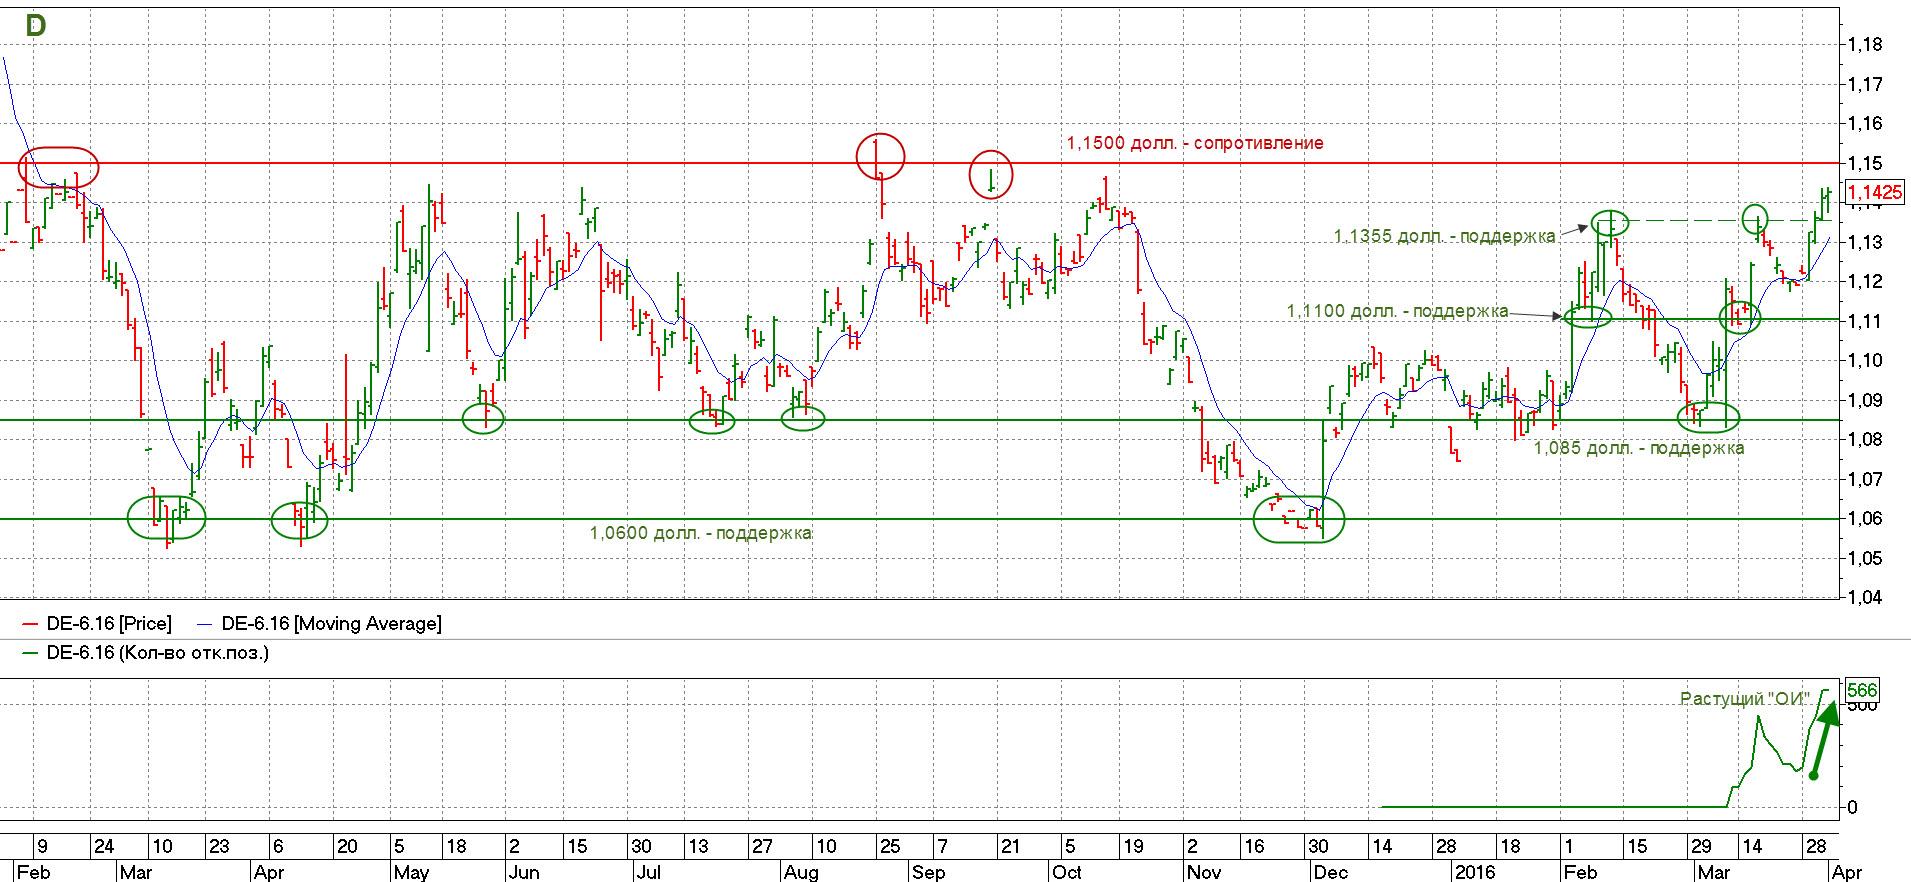 Фьючерс на евро-доллар